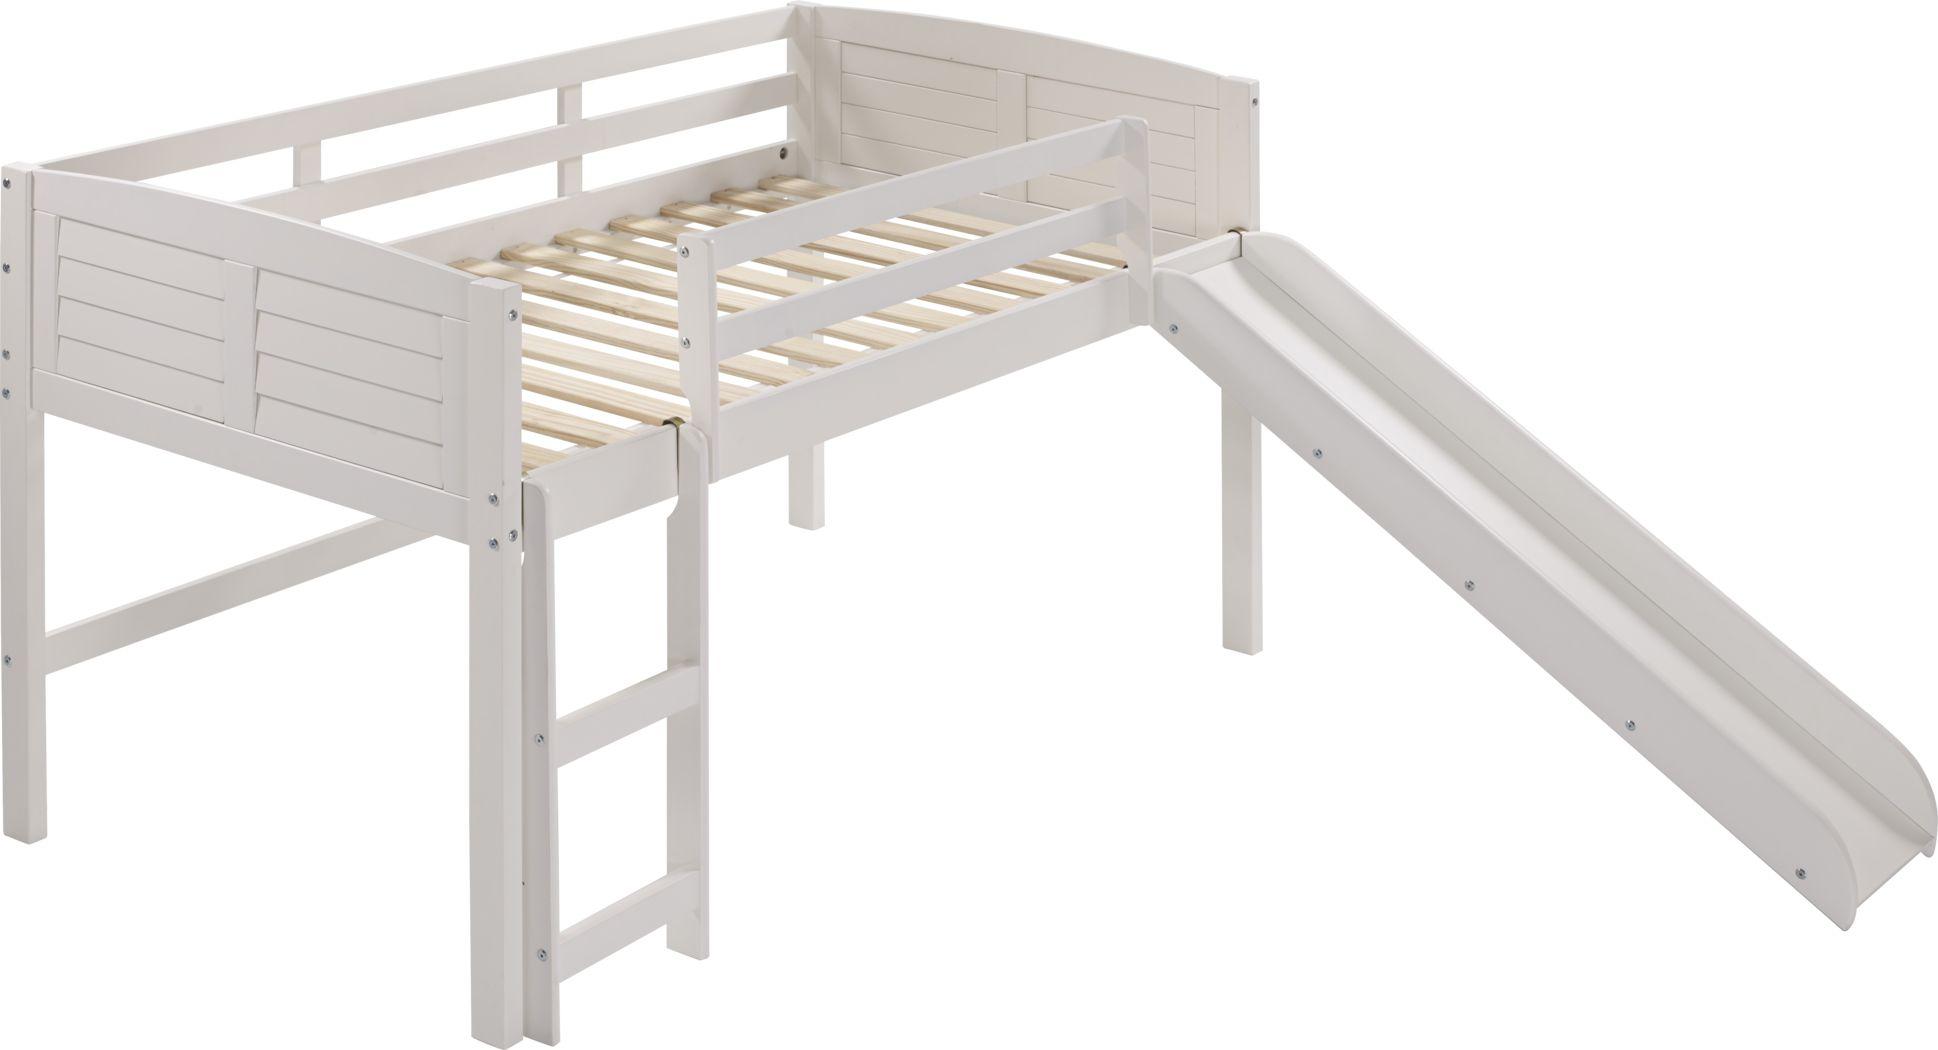 Kids Camp Hideaway White Twin Jr. Loft Bed with Slide